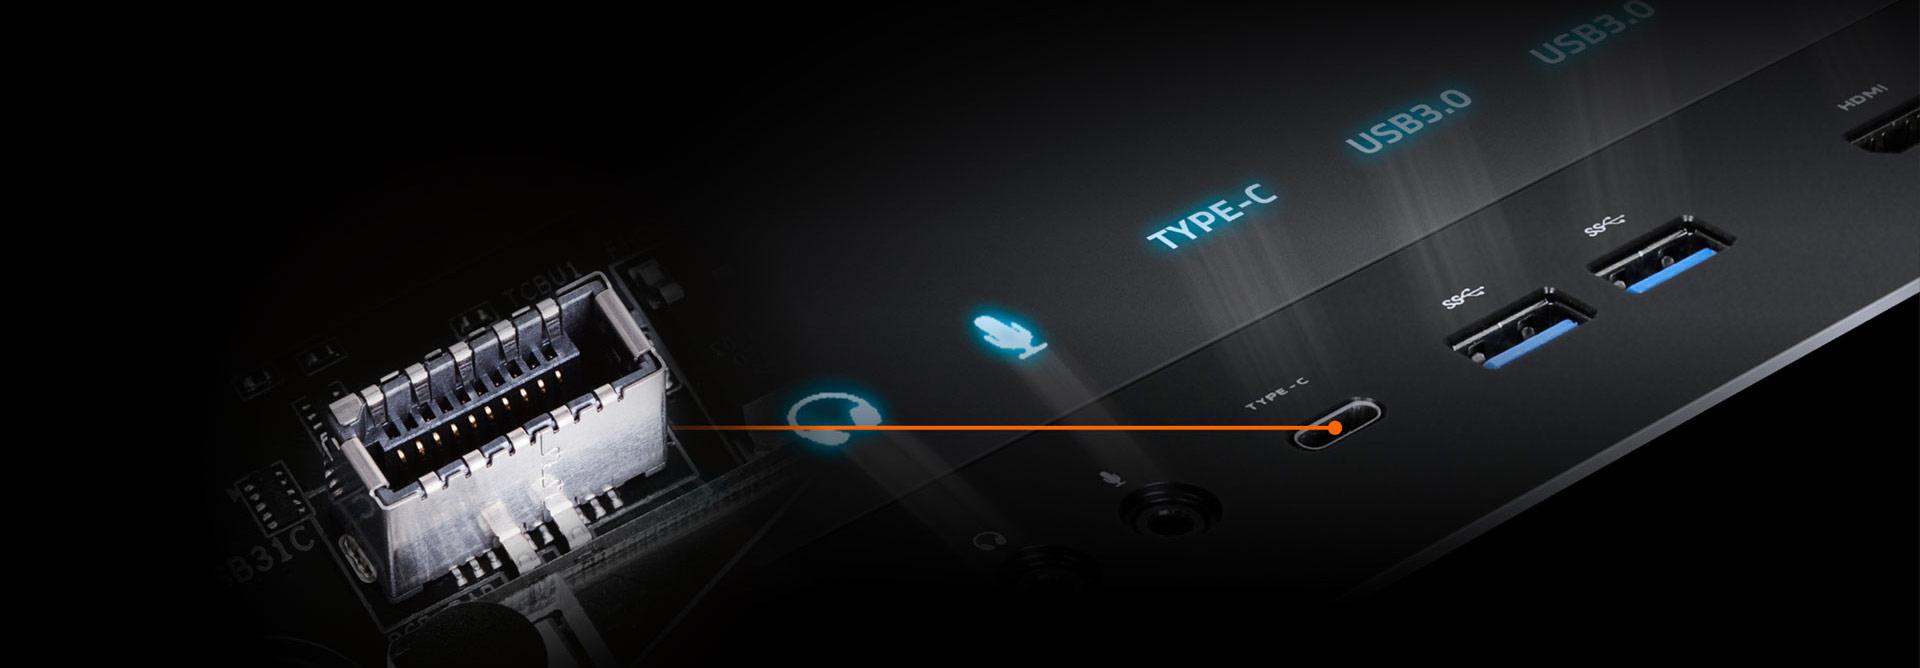 GIGABYTE H370 AORUS Gaming 3 WIFI LGA 1151 (300 Series) ATX Intel  Motherboard - Newegg com